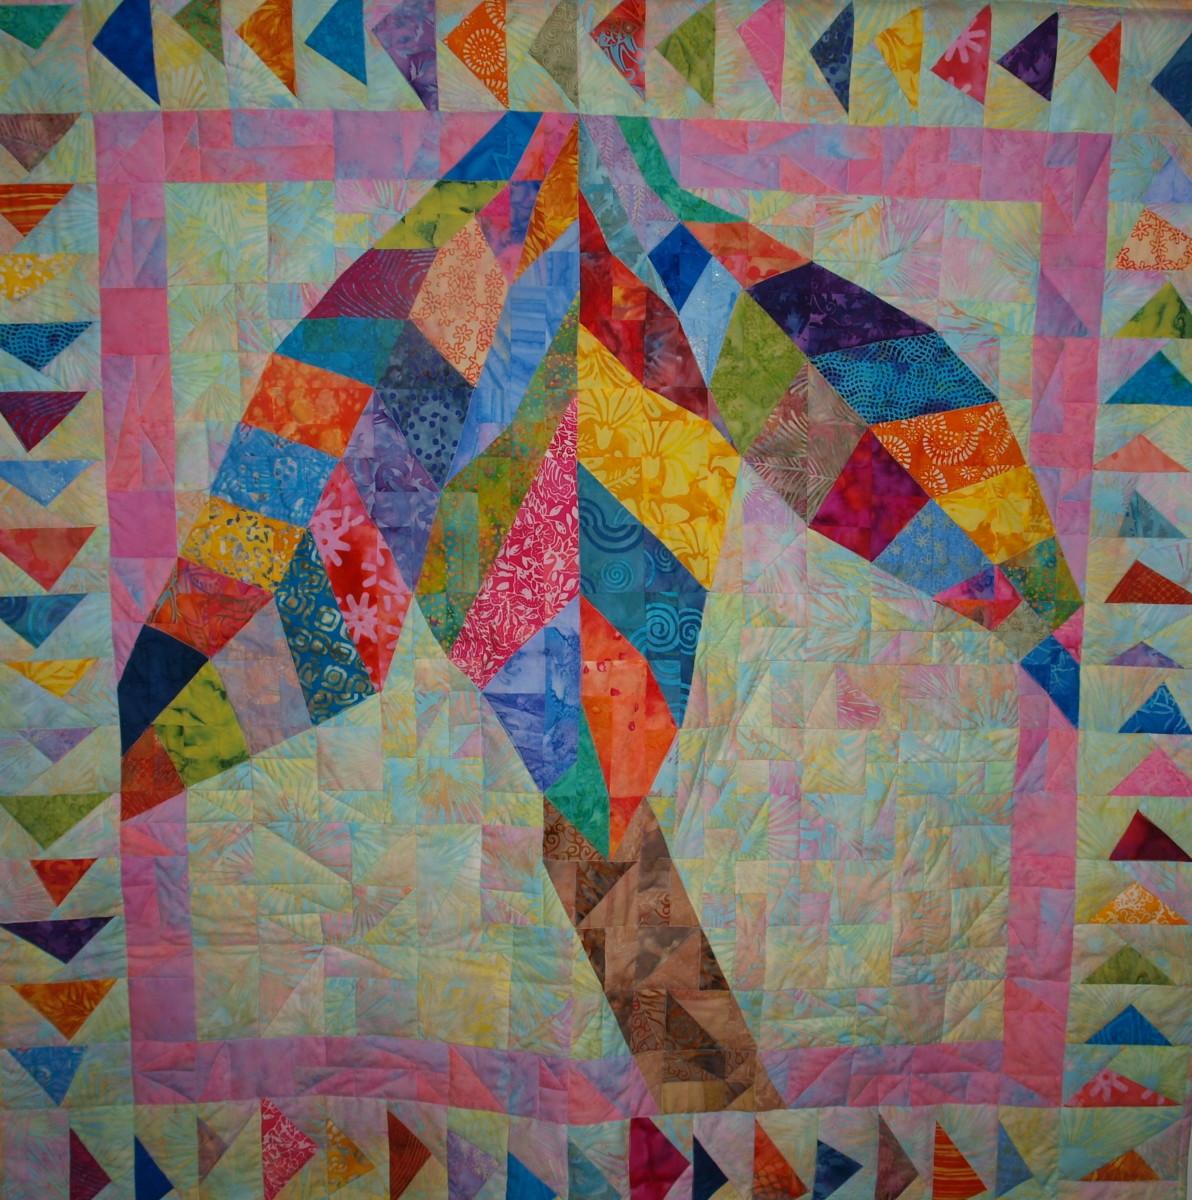 """Key West"" Original Quilt by the author"